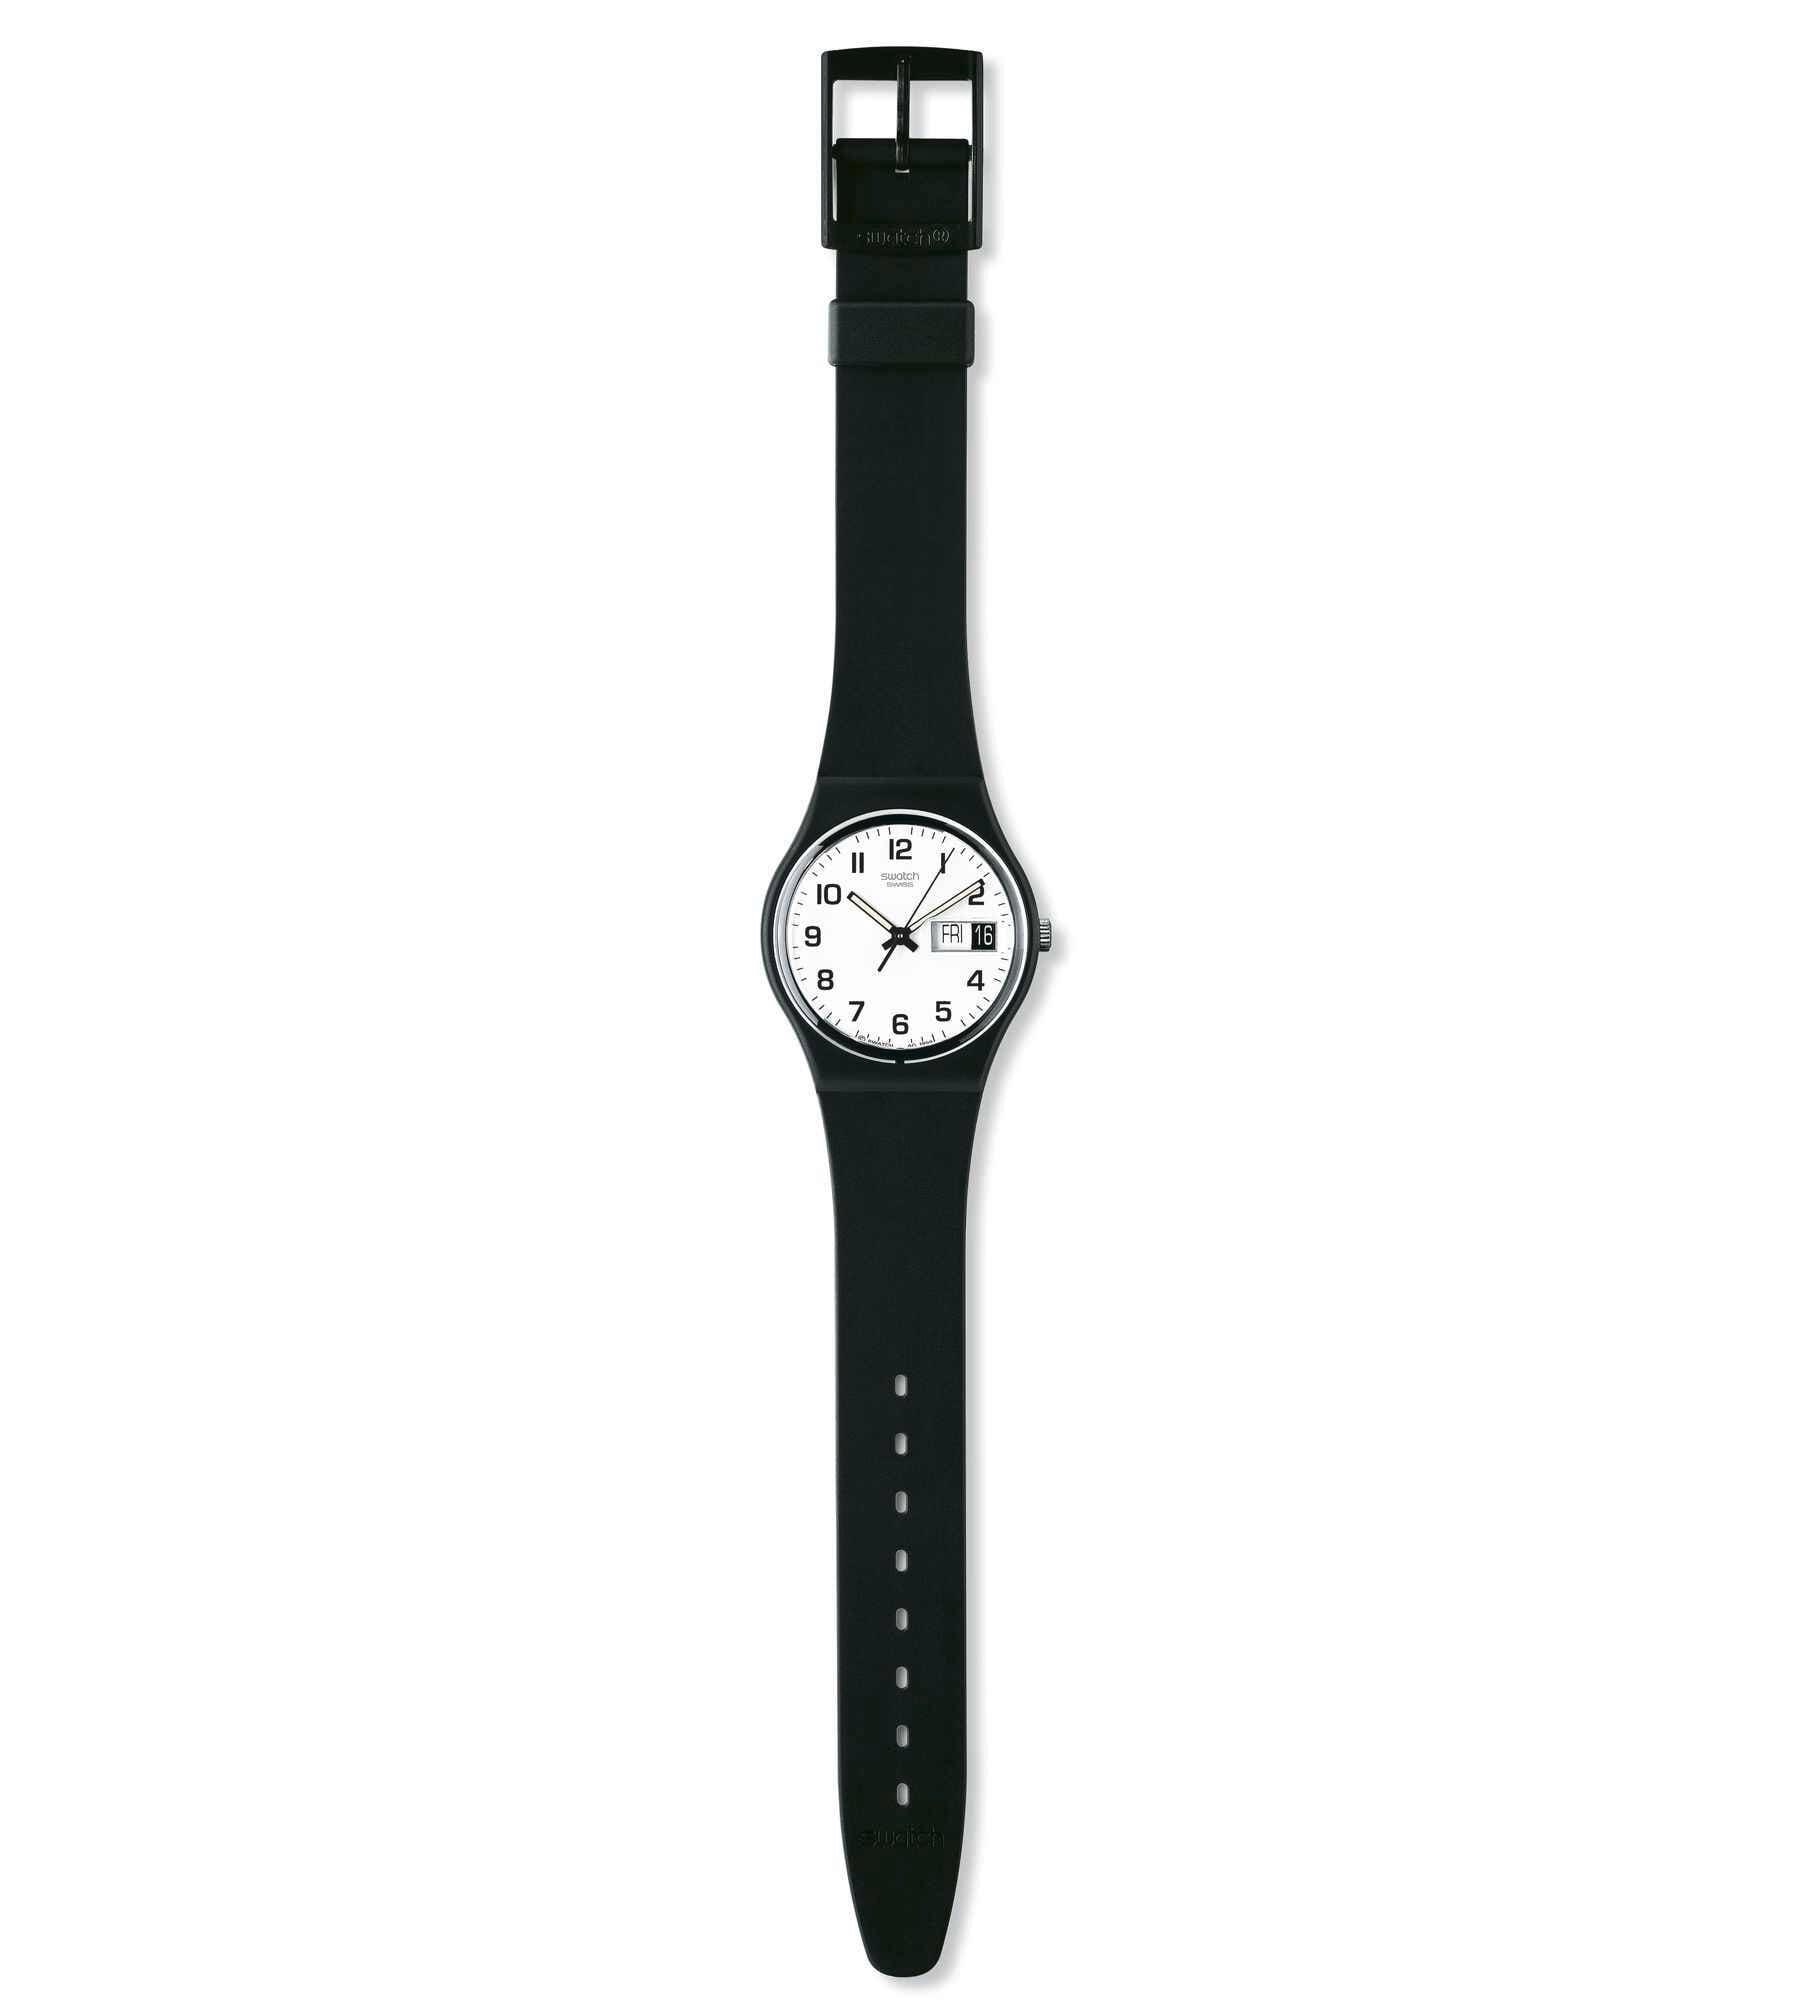 d0c3e55bd68 Swatch® United Kingdom - ONCE AGAIN GB743